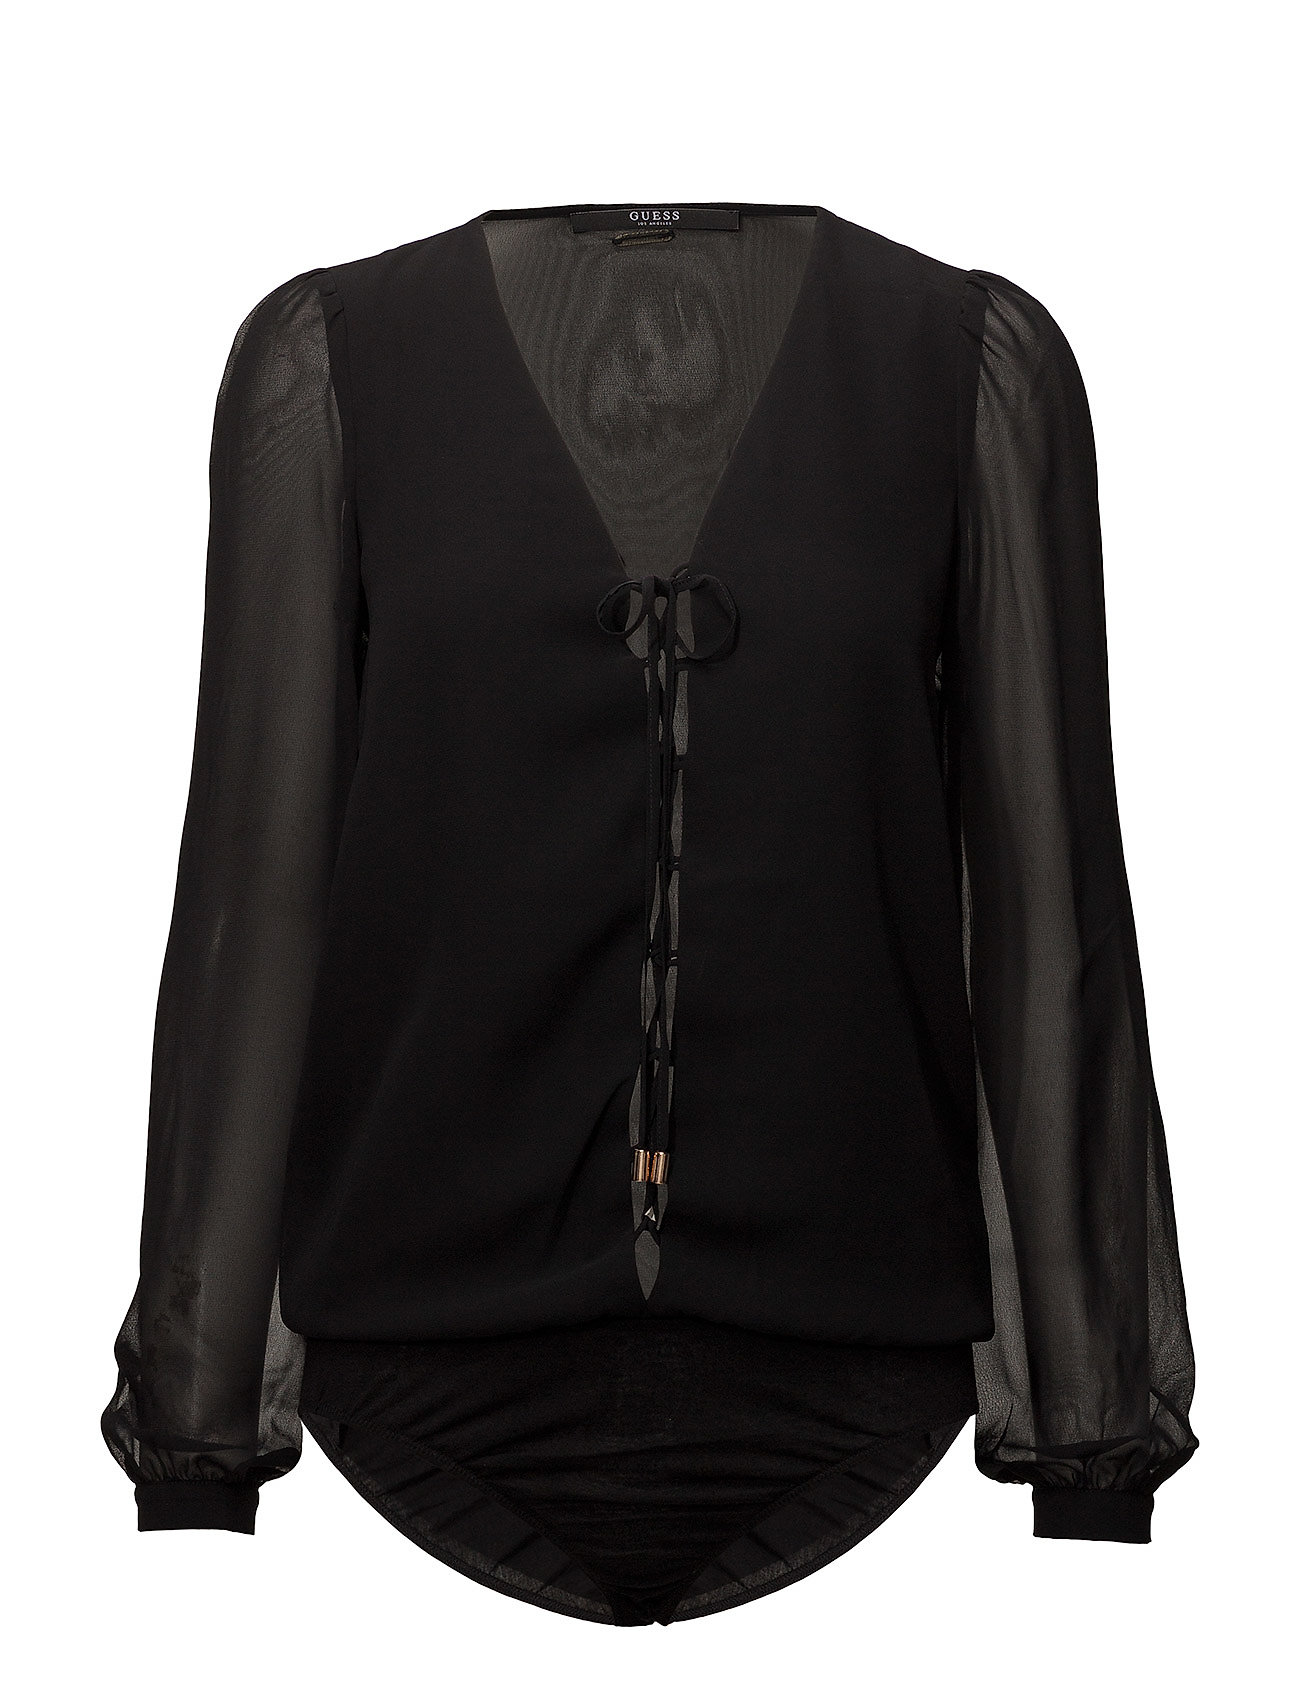 4e336d4cef35e8 Ls Concetta Body Top (Jet Black A996) (47.94 €) - GUESS Jeans ...